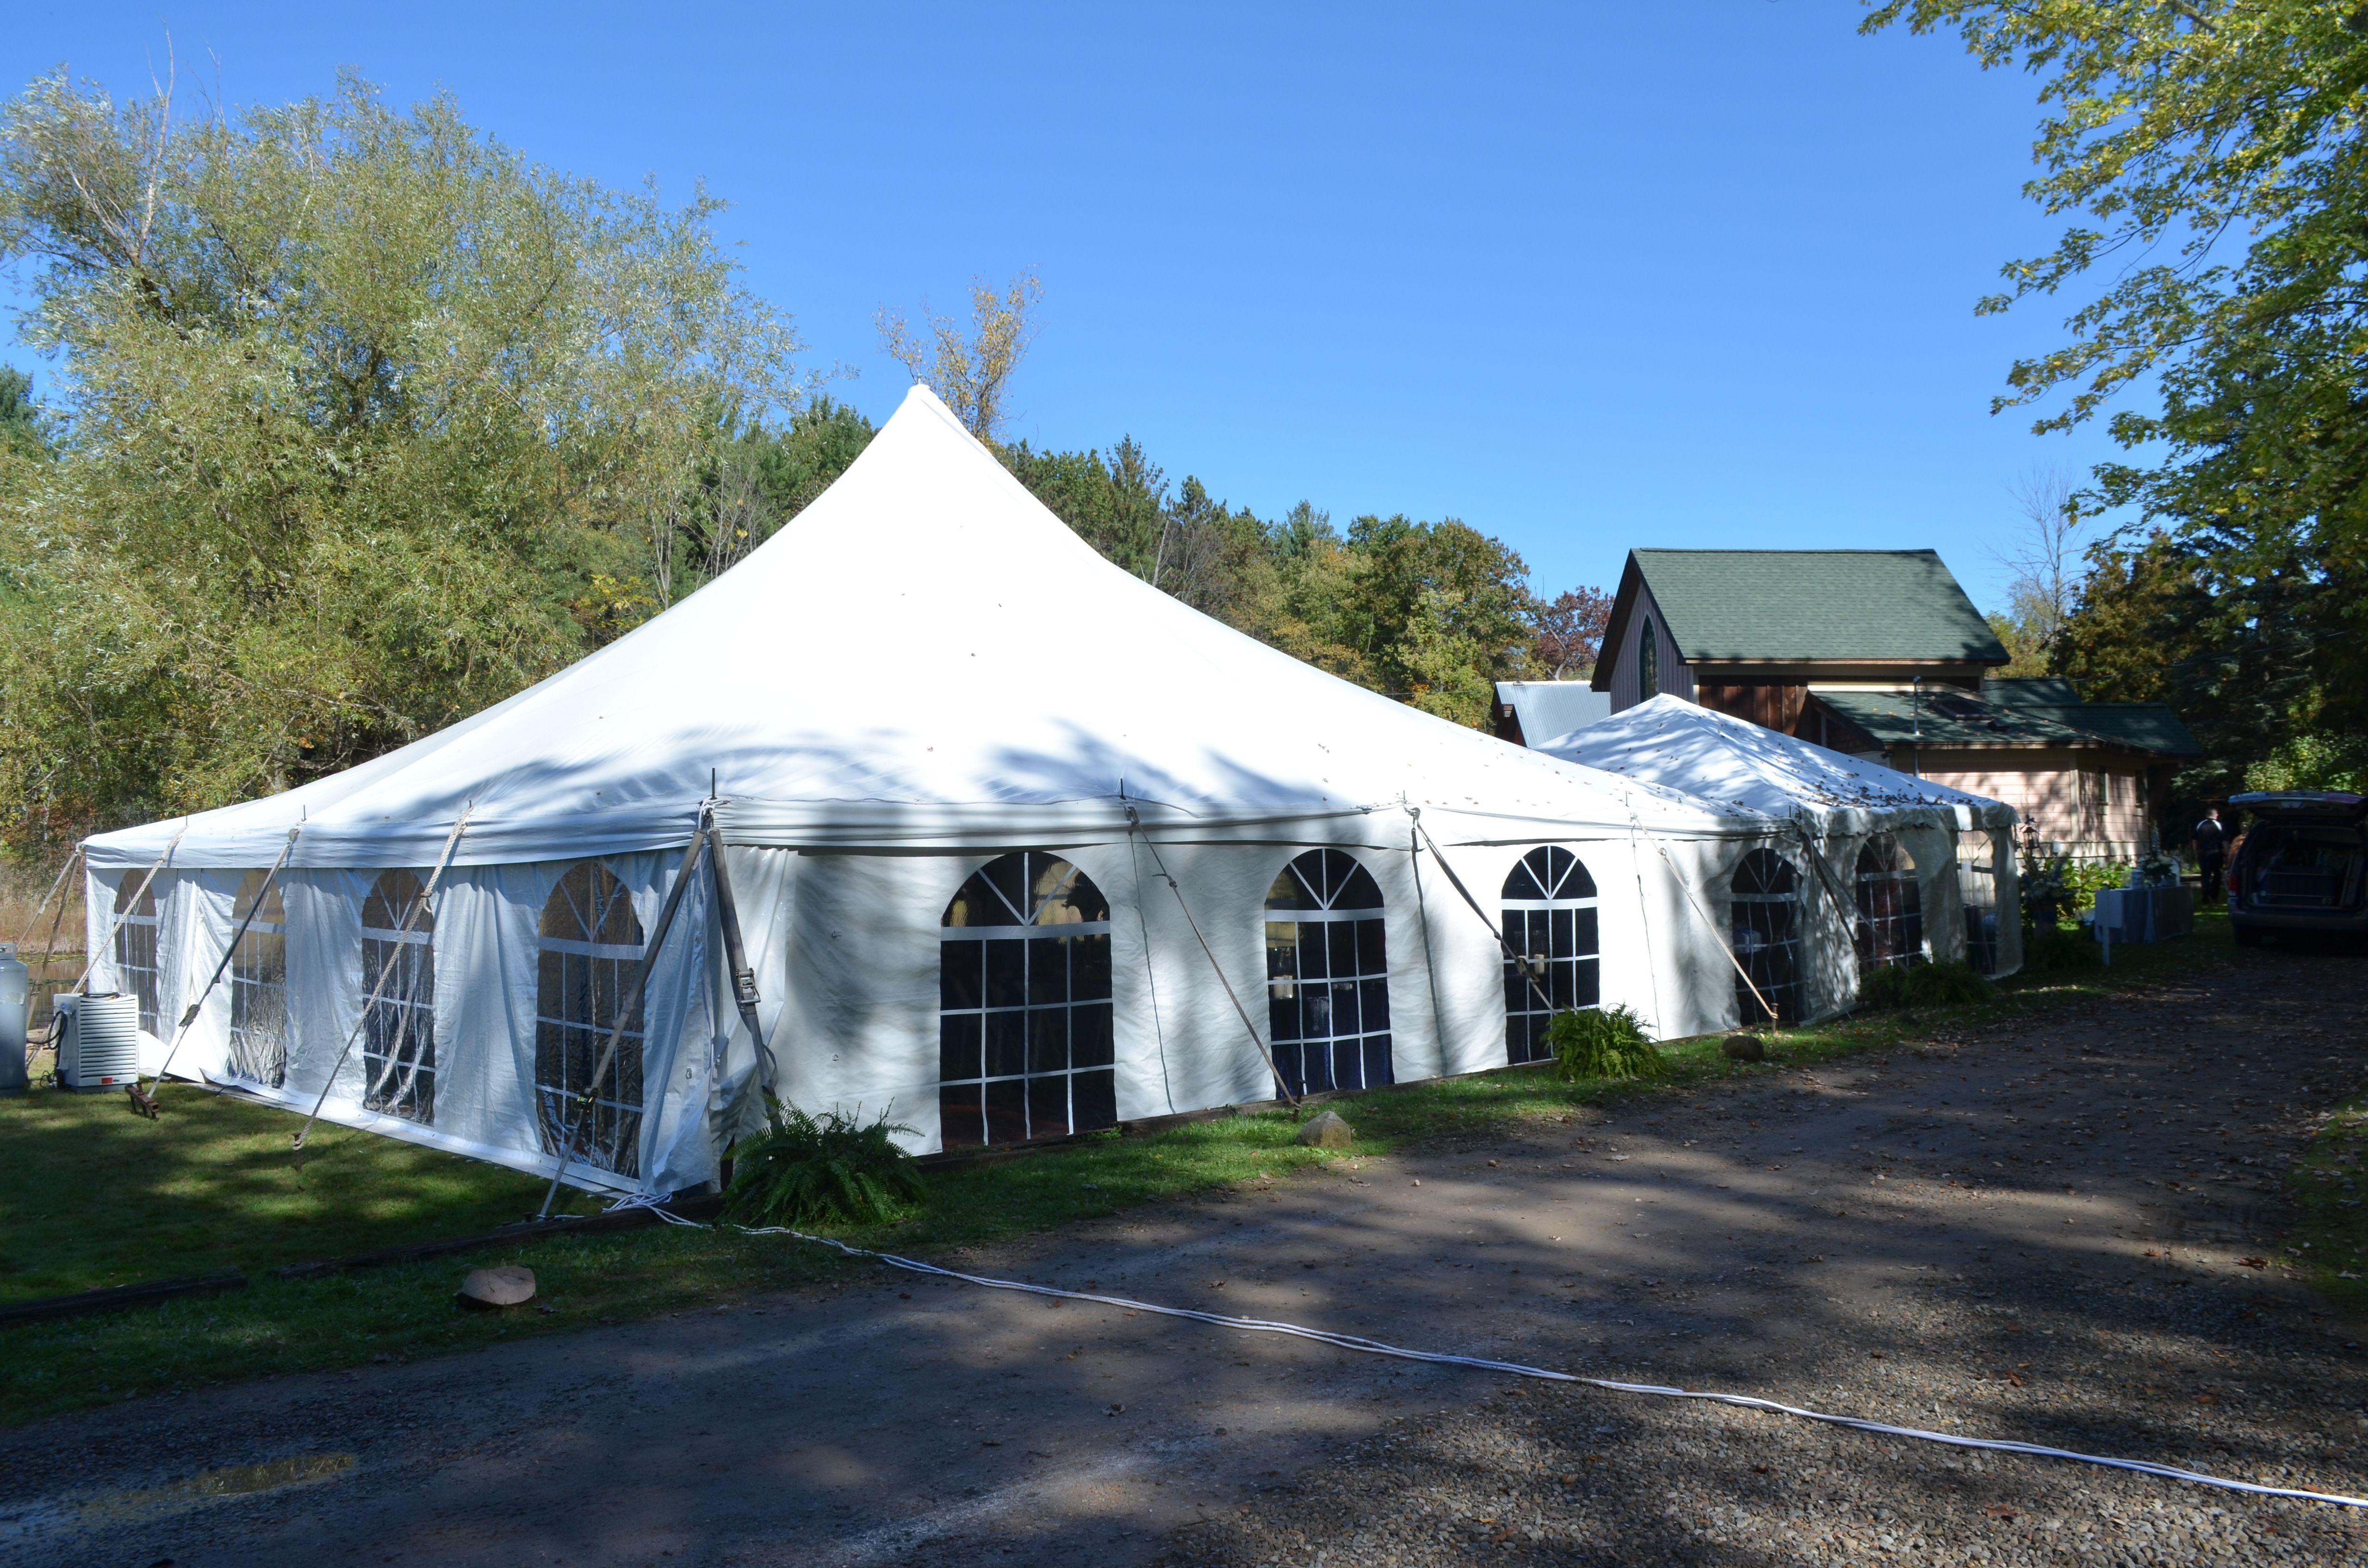 40x40 pole tent & 40x40 pole tent | Event Rentals | Pinterest | Tents